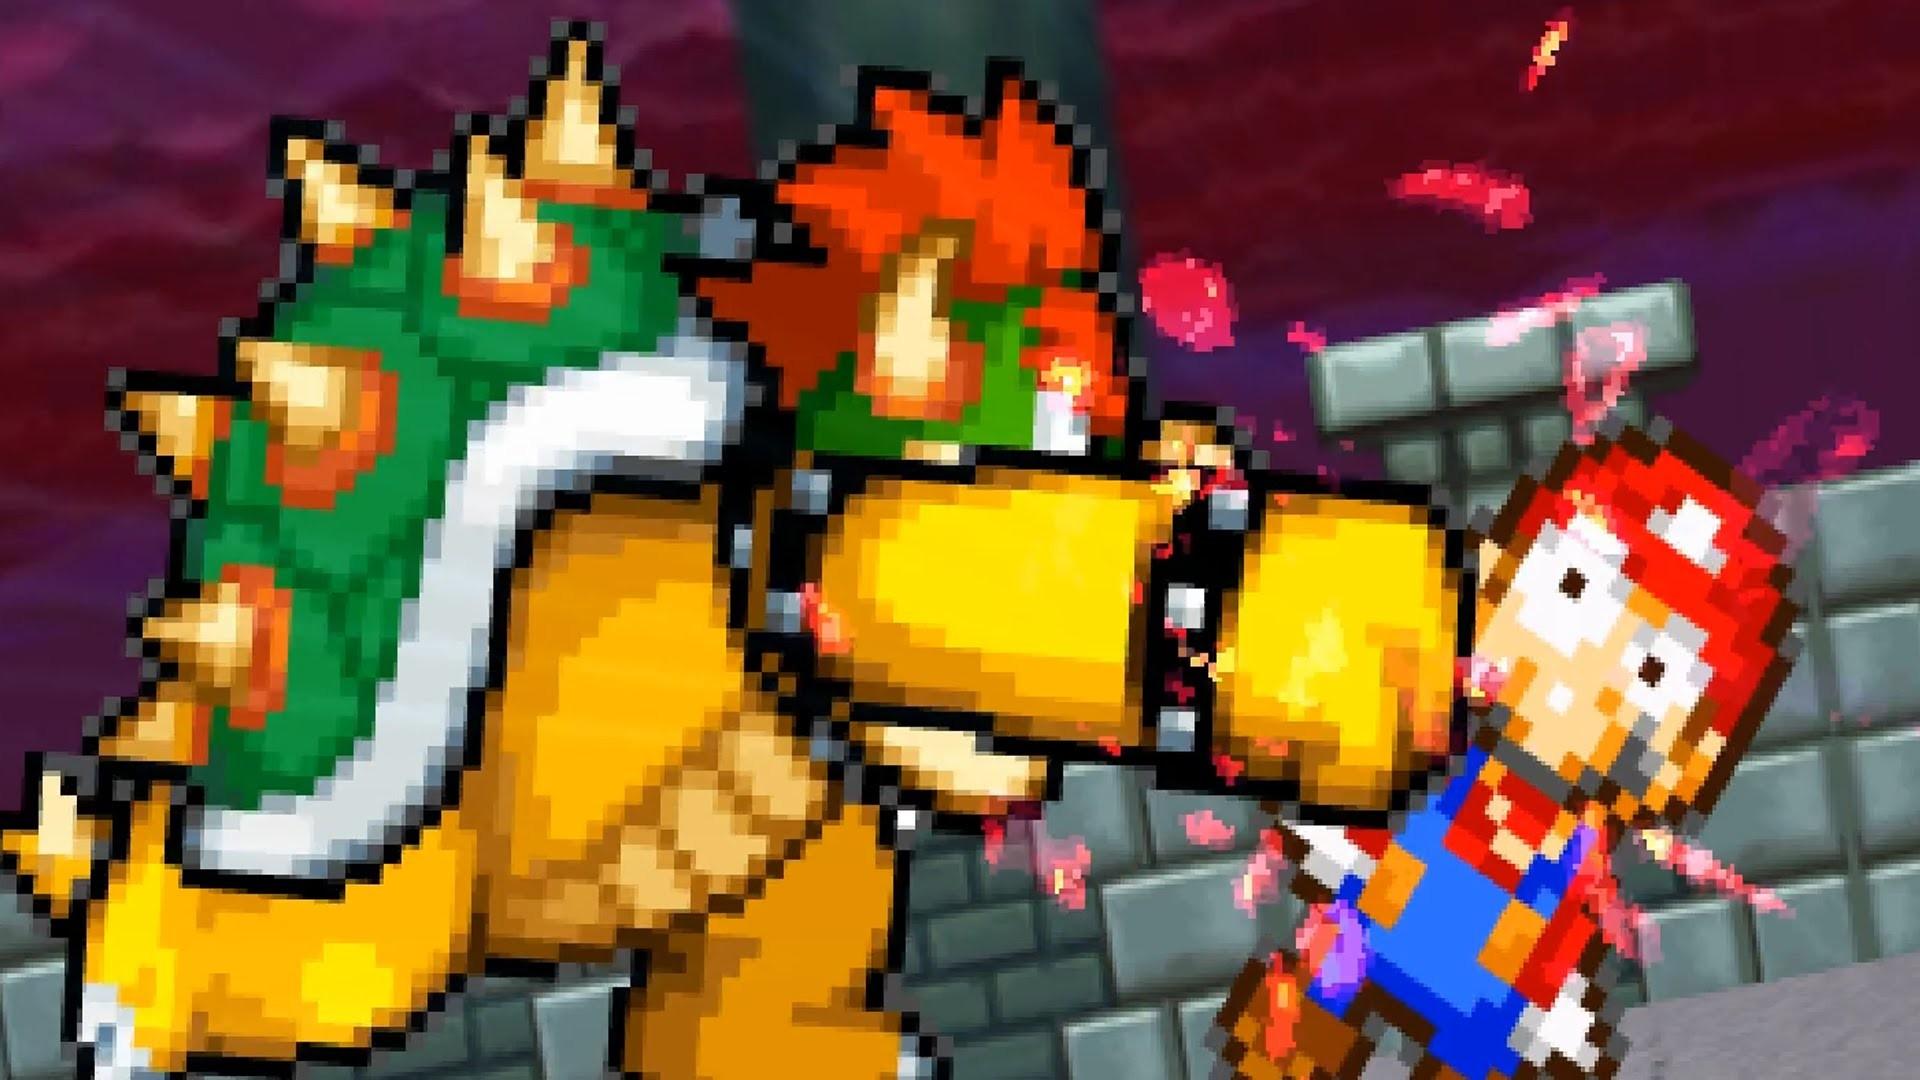 Mario vs Bowser Wallpaper (72+ images)